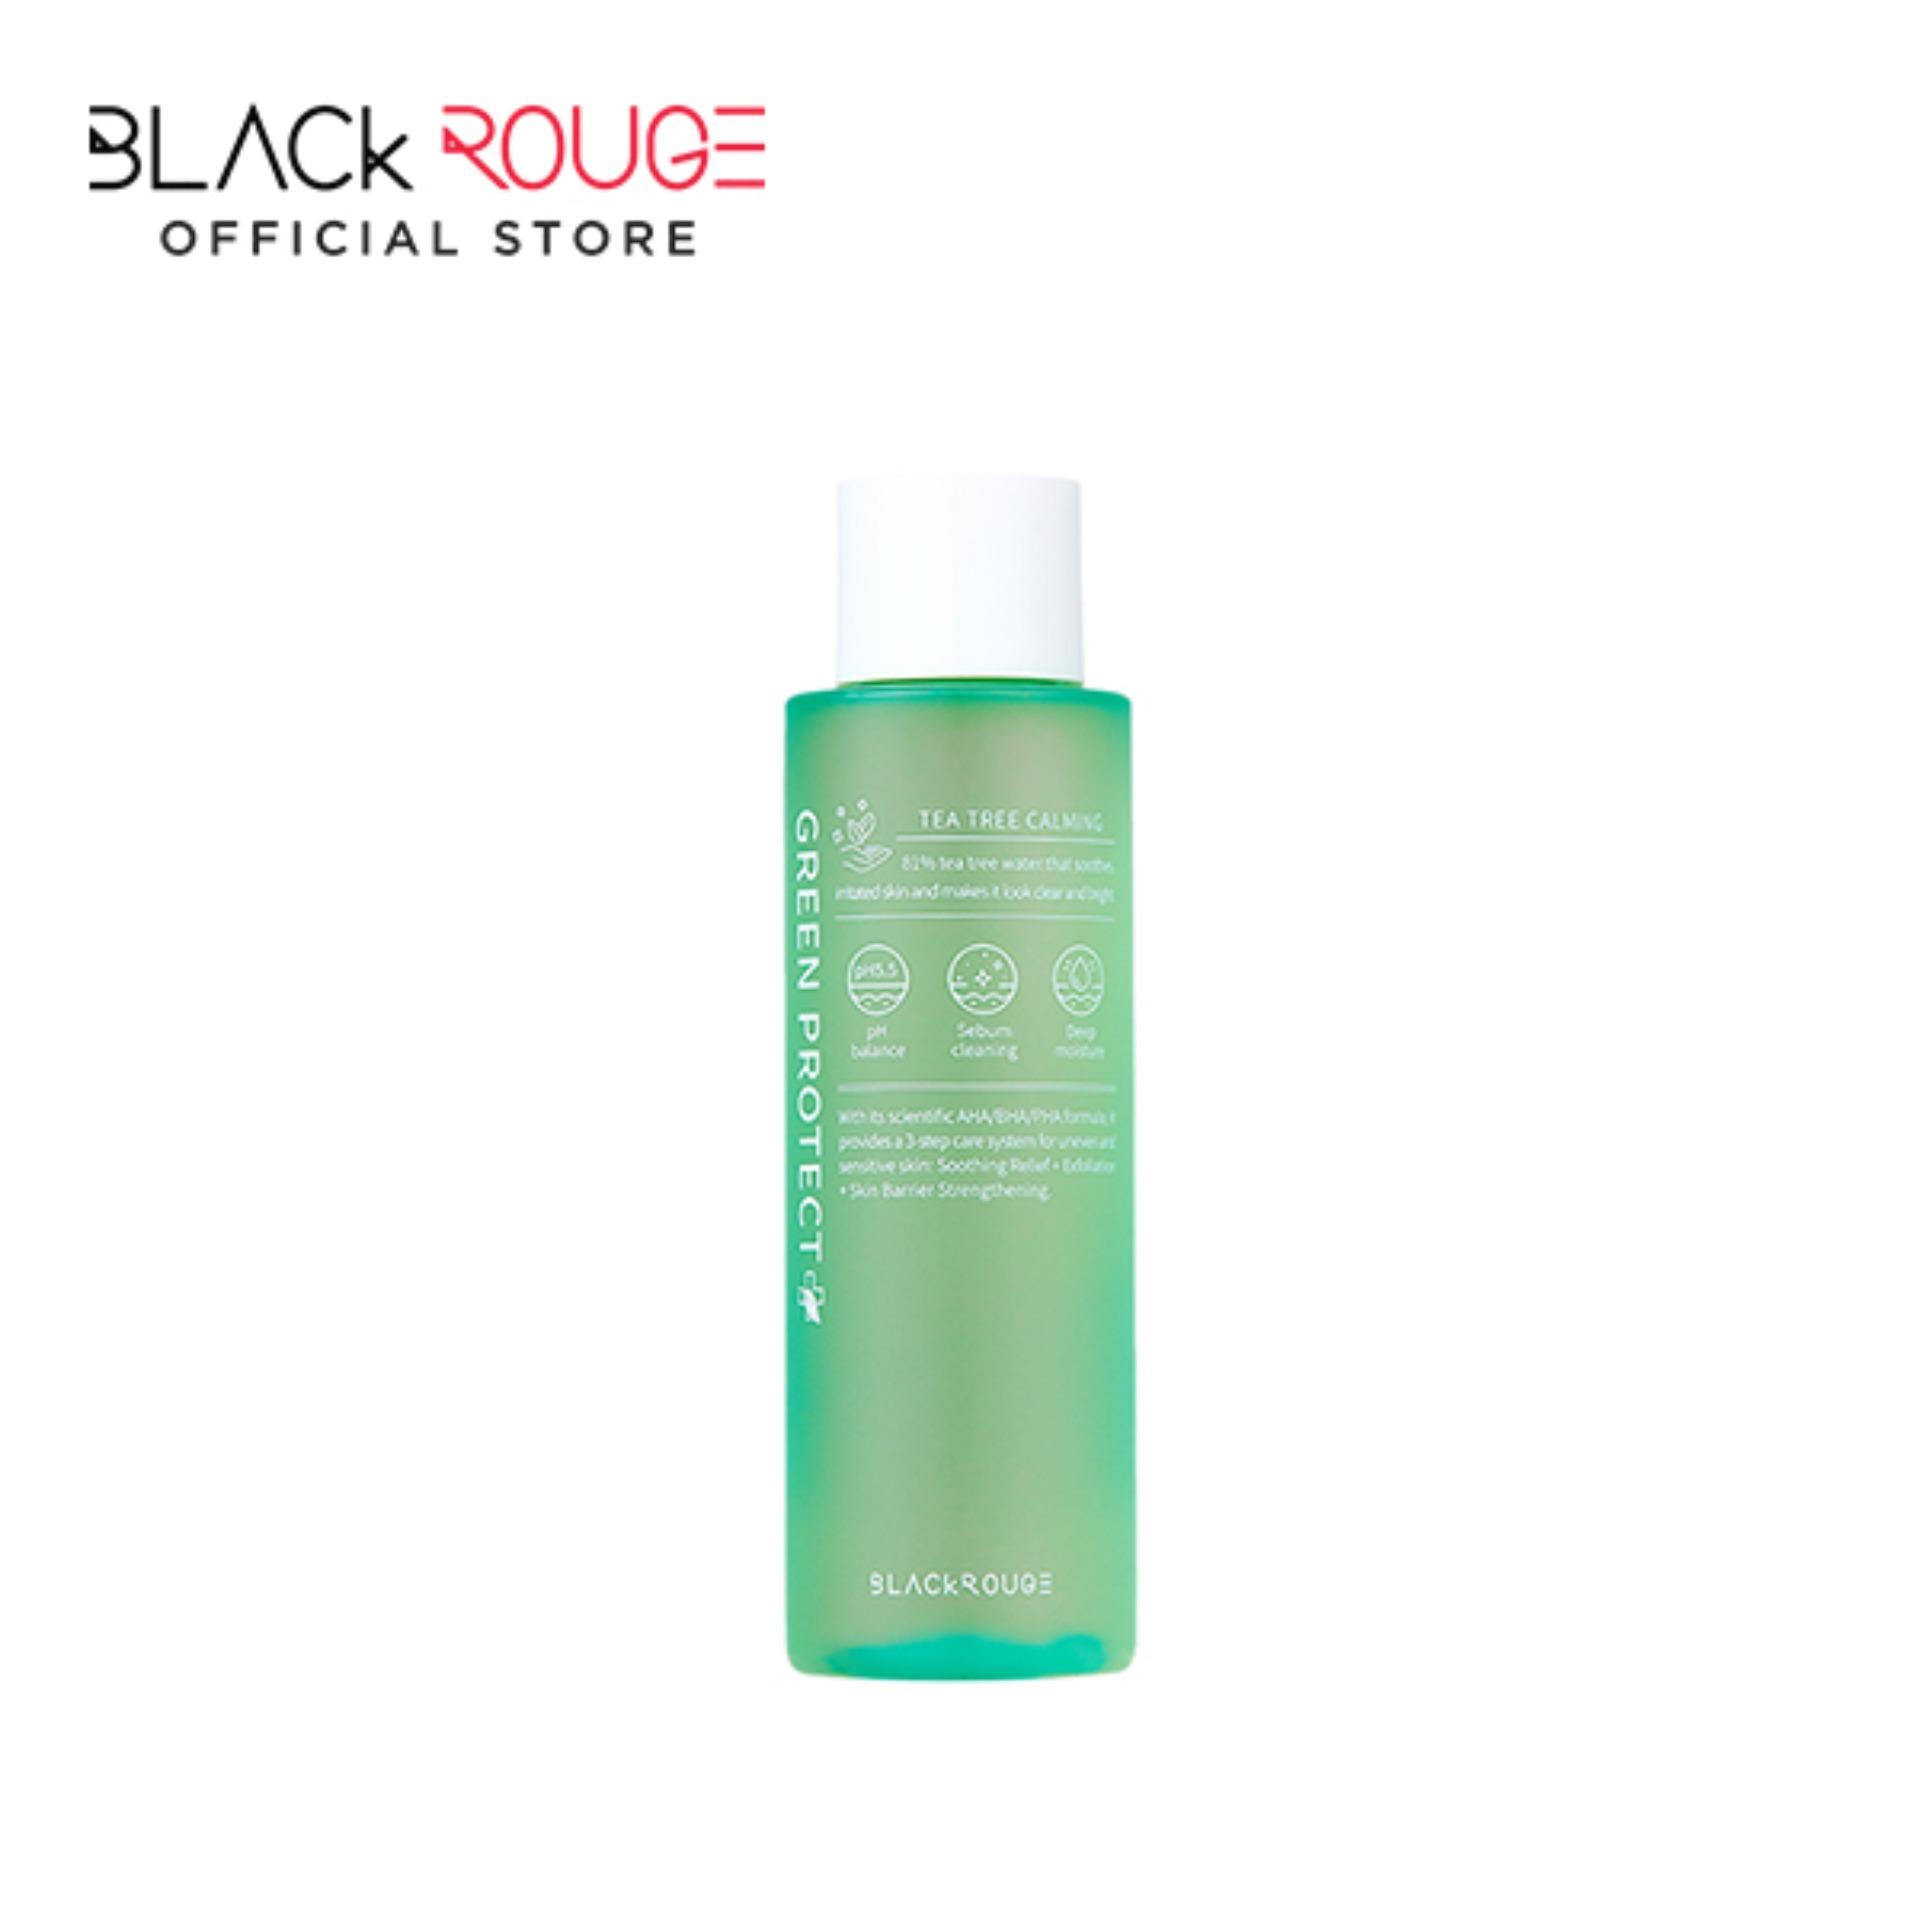 Nước hoa hồng Black Rouge Green Protect Toner 150ml cao cấp